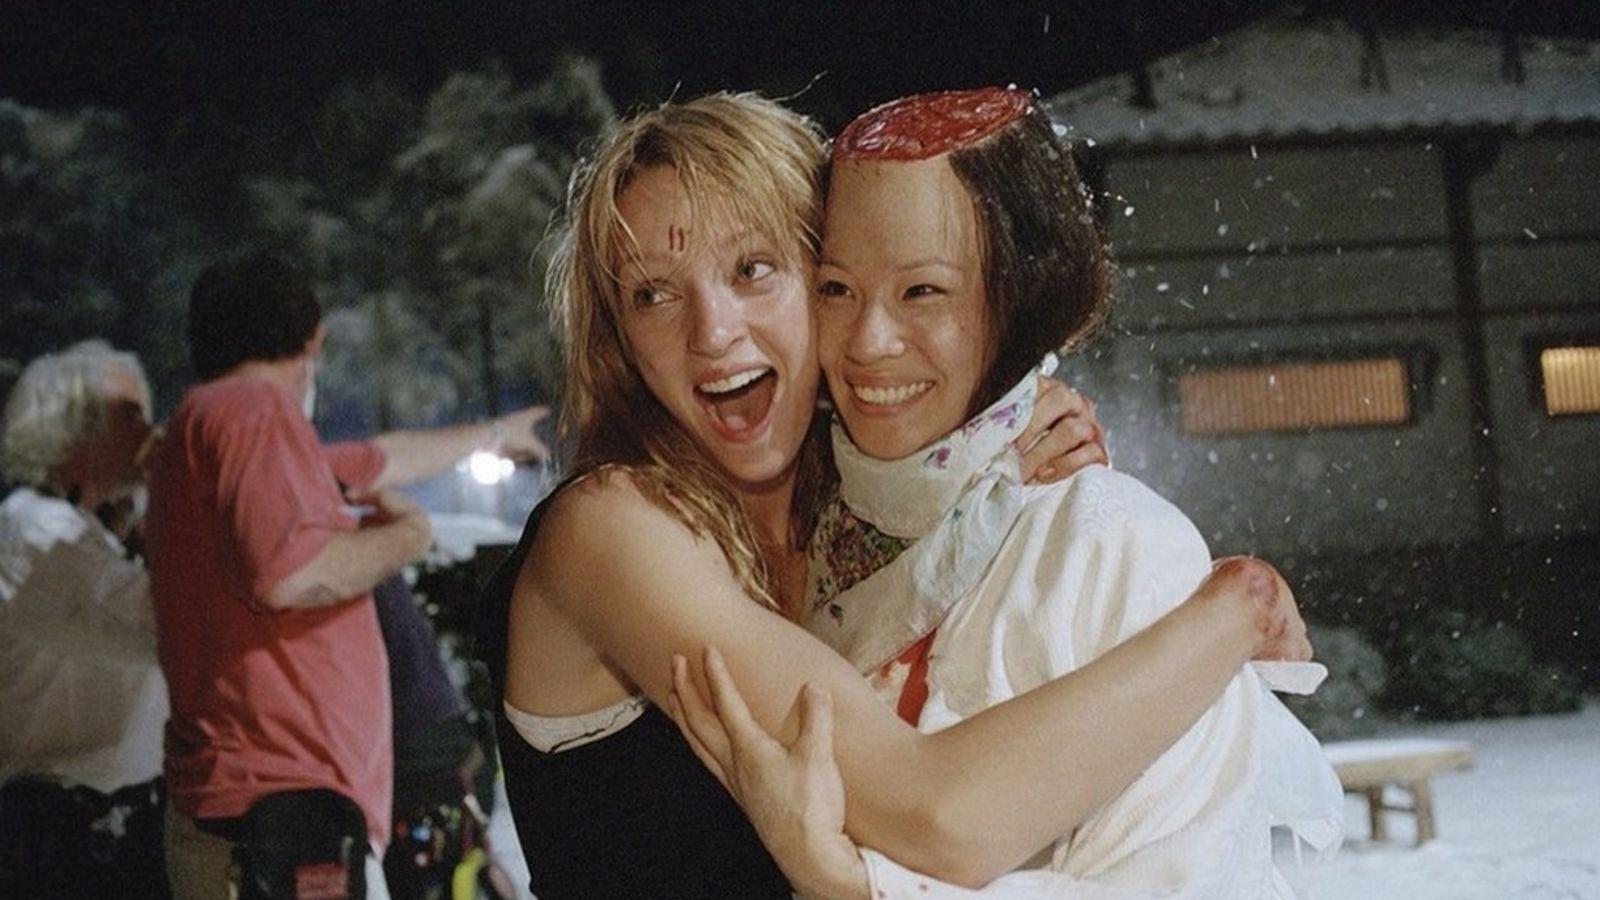 Uma Thurman et Lucy Liu sur le tournage du film Kill Bill Volume 1